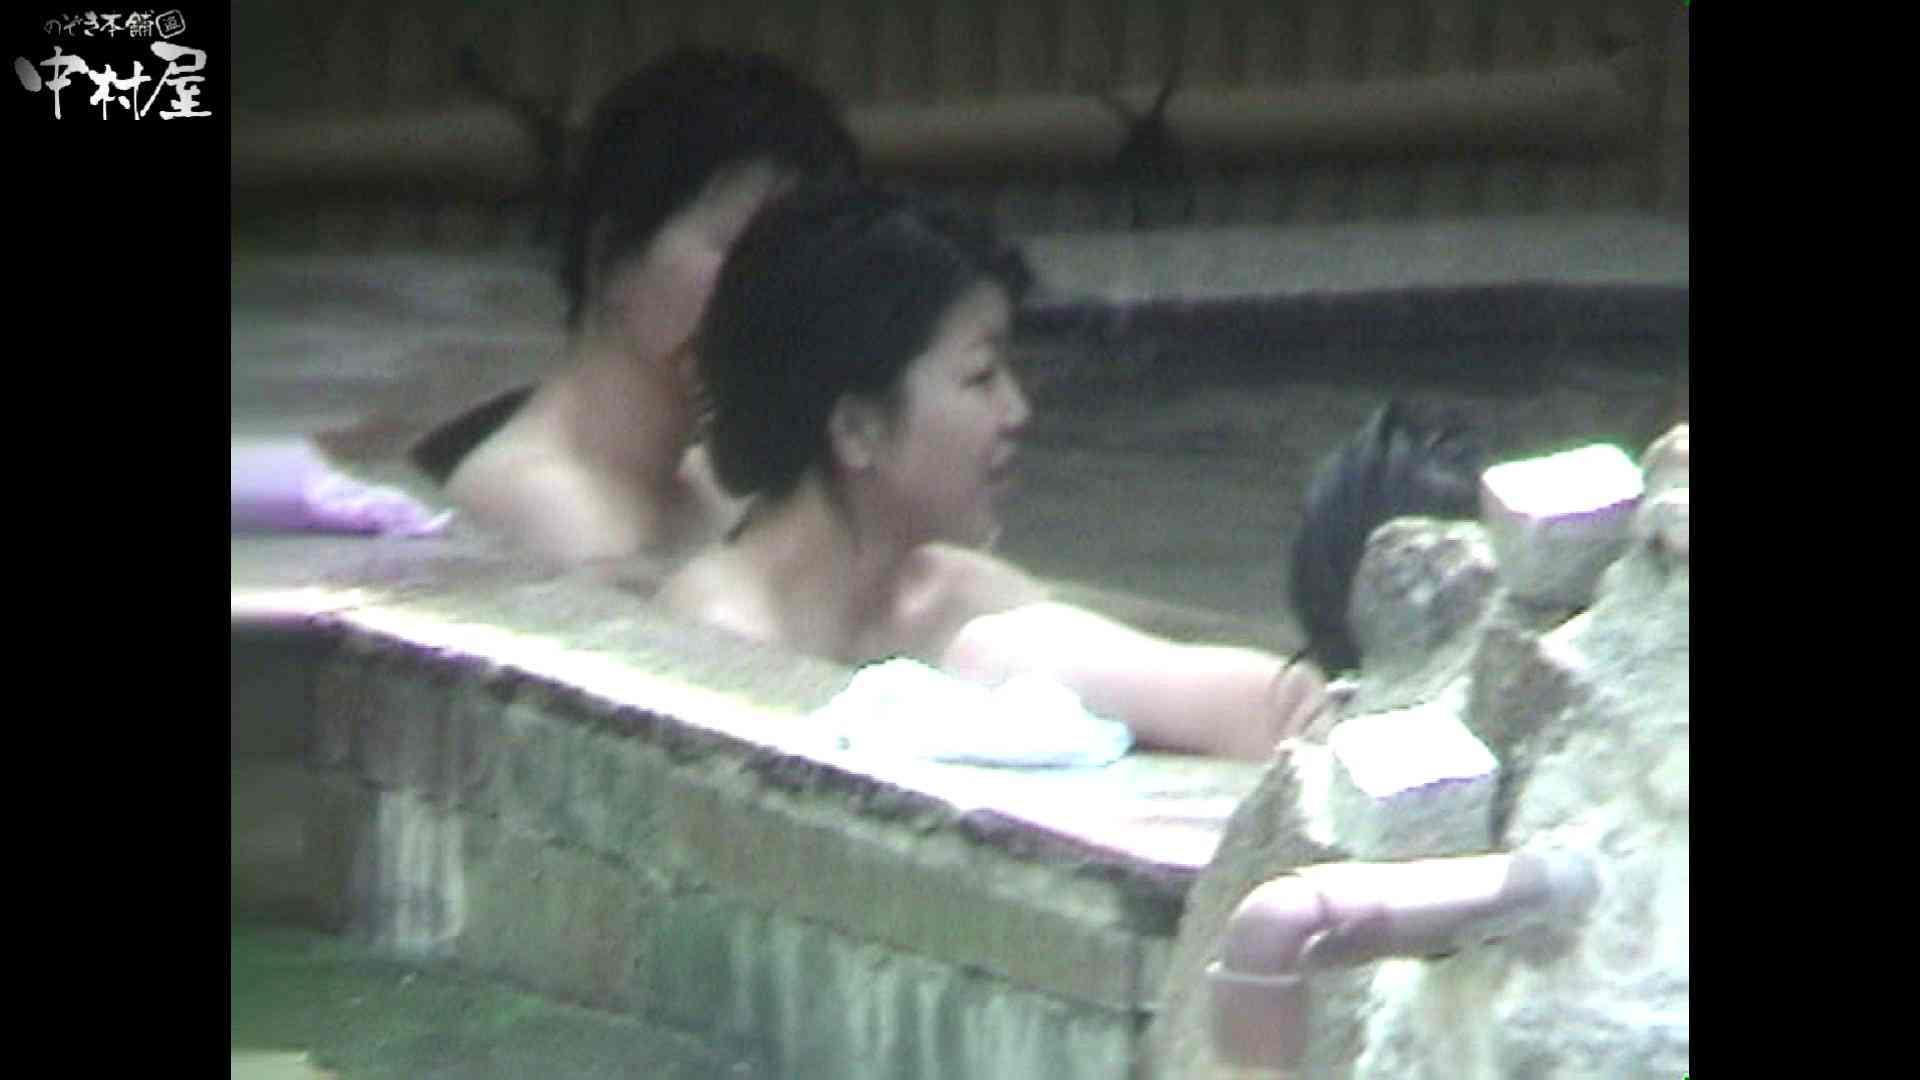 Aquaな露天風呂Vol.936 盗撮映像  110Pix 55